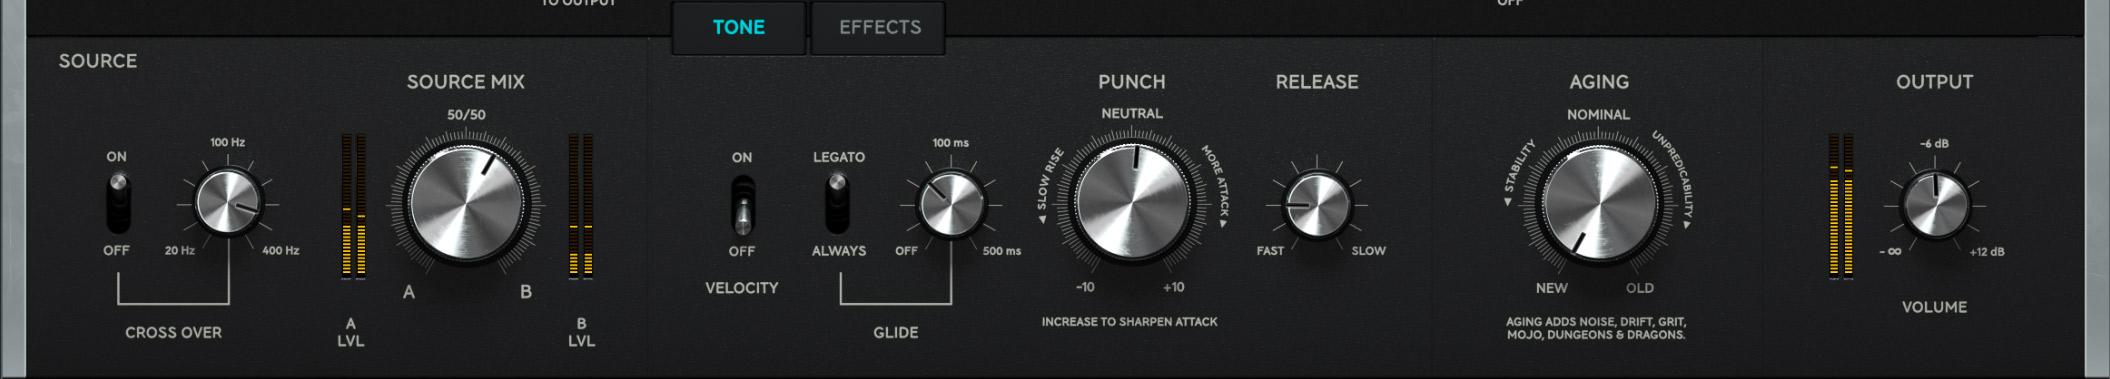 tone-section.jpg